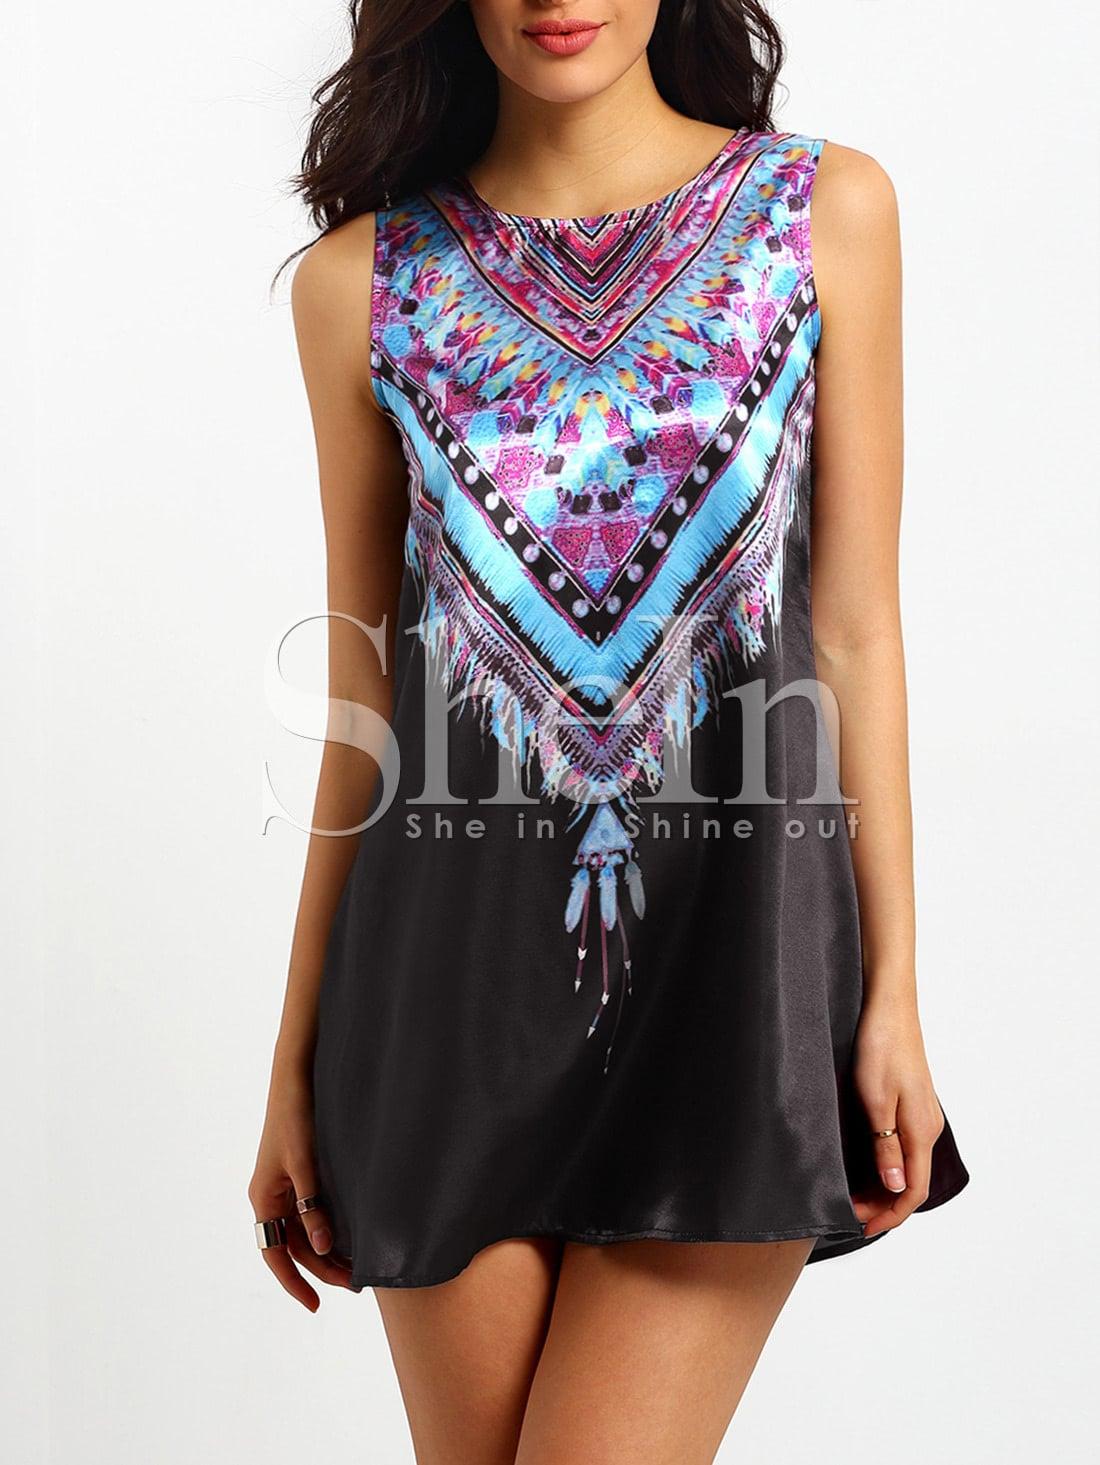 Tribal Print Tradition Shift Black DressTribal Print Tradition Shift Black Dress<br><br>color: Multicolor<br>size: L,XL